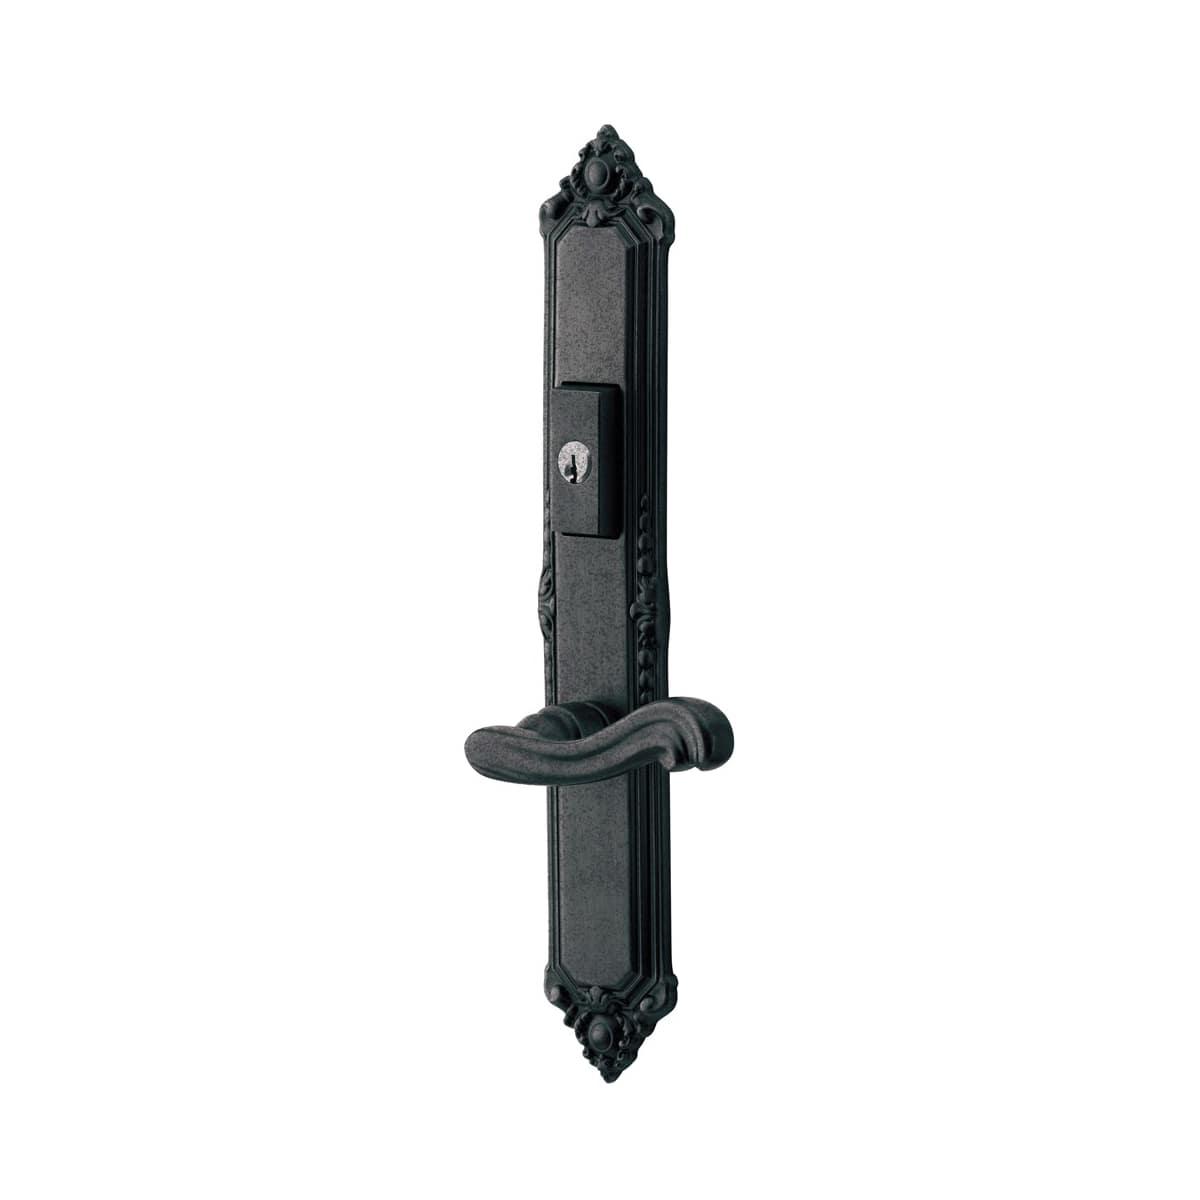 Baldwin Kensington Door Configuration 5 Inactive Multi Point Trim Lever Set with American Cylinder Above or Below Handle